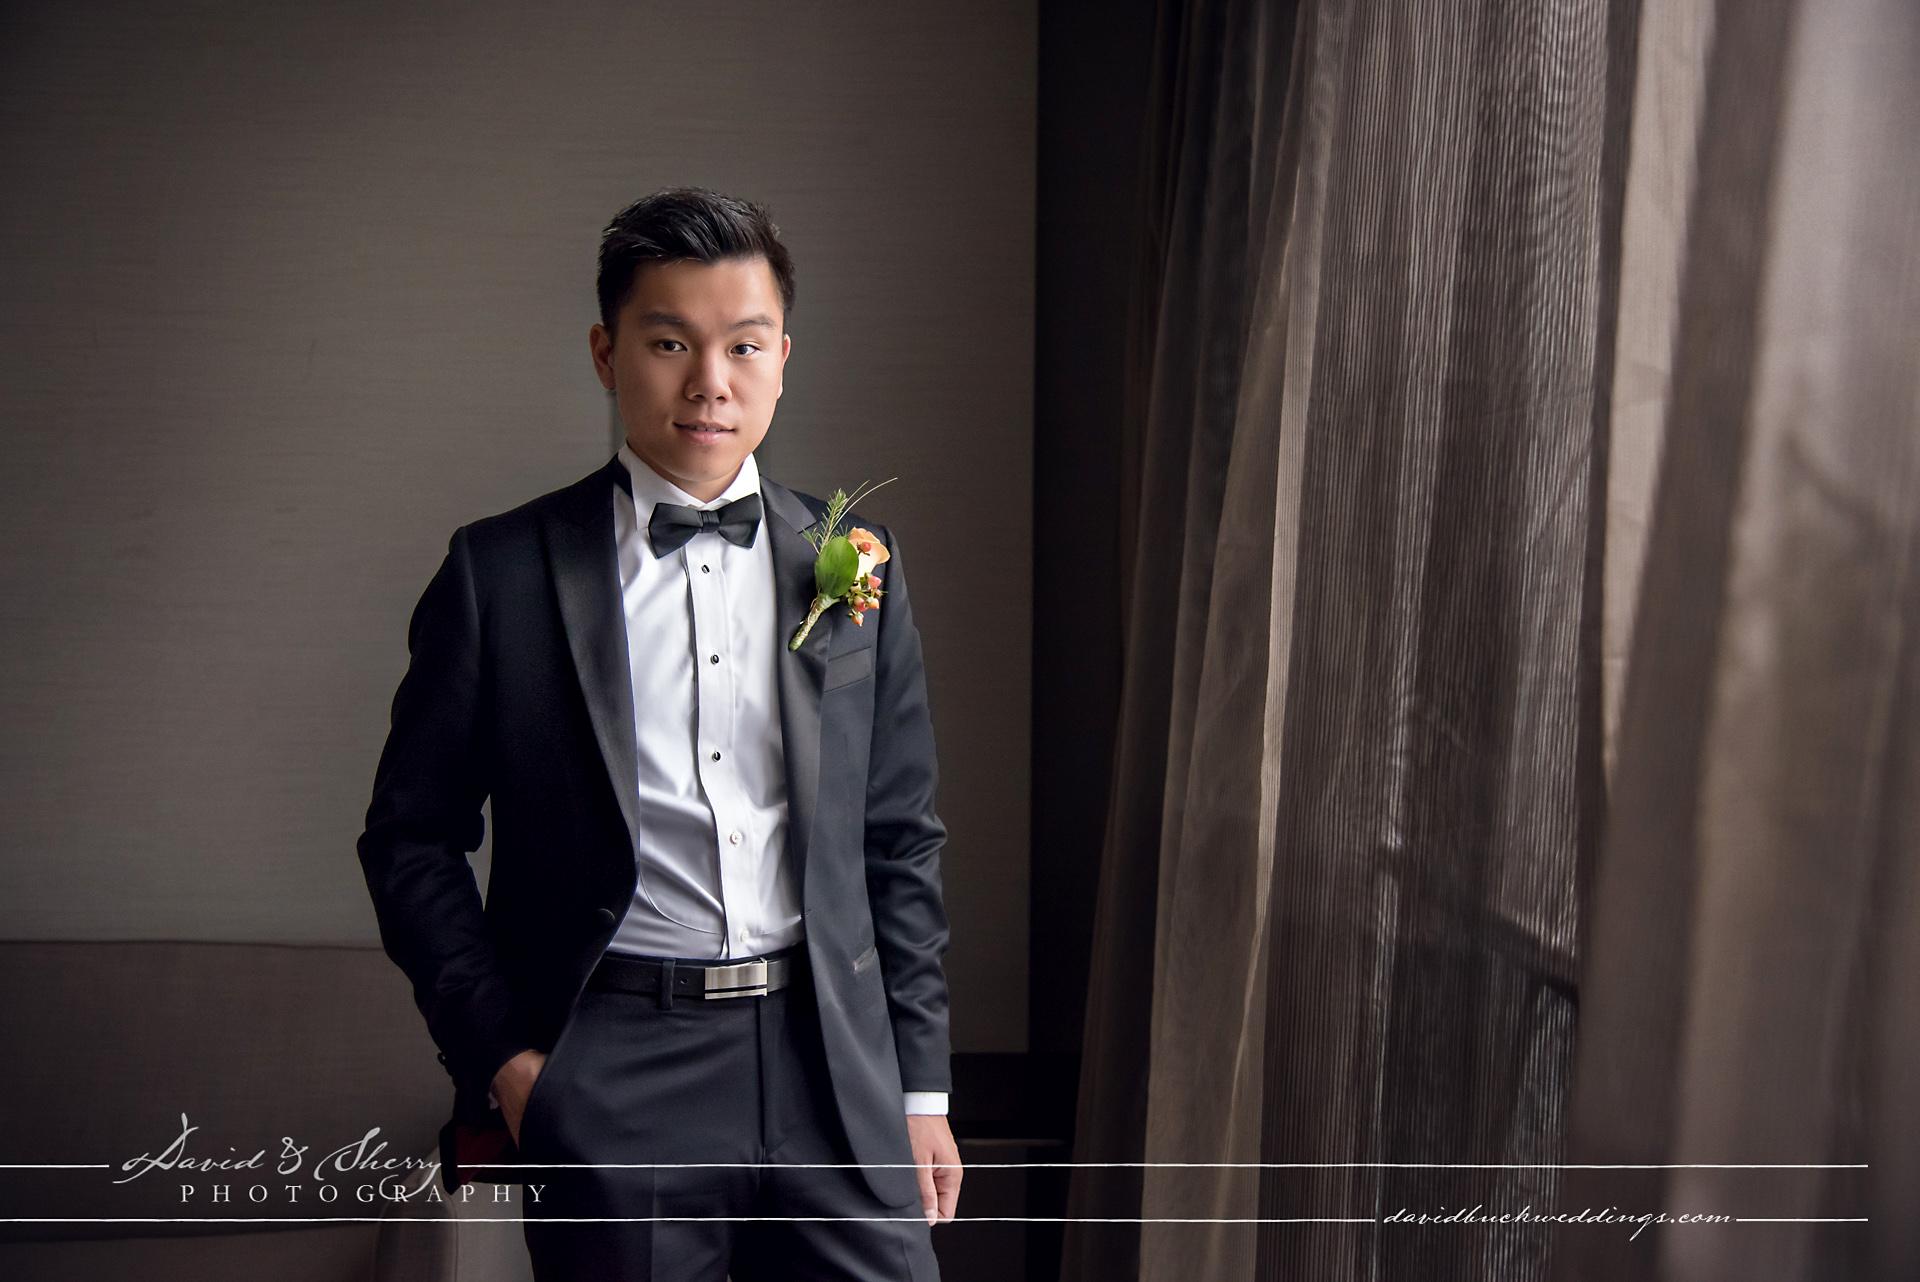 Toronto_Hilton_Markham_Suites_Wedding_03